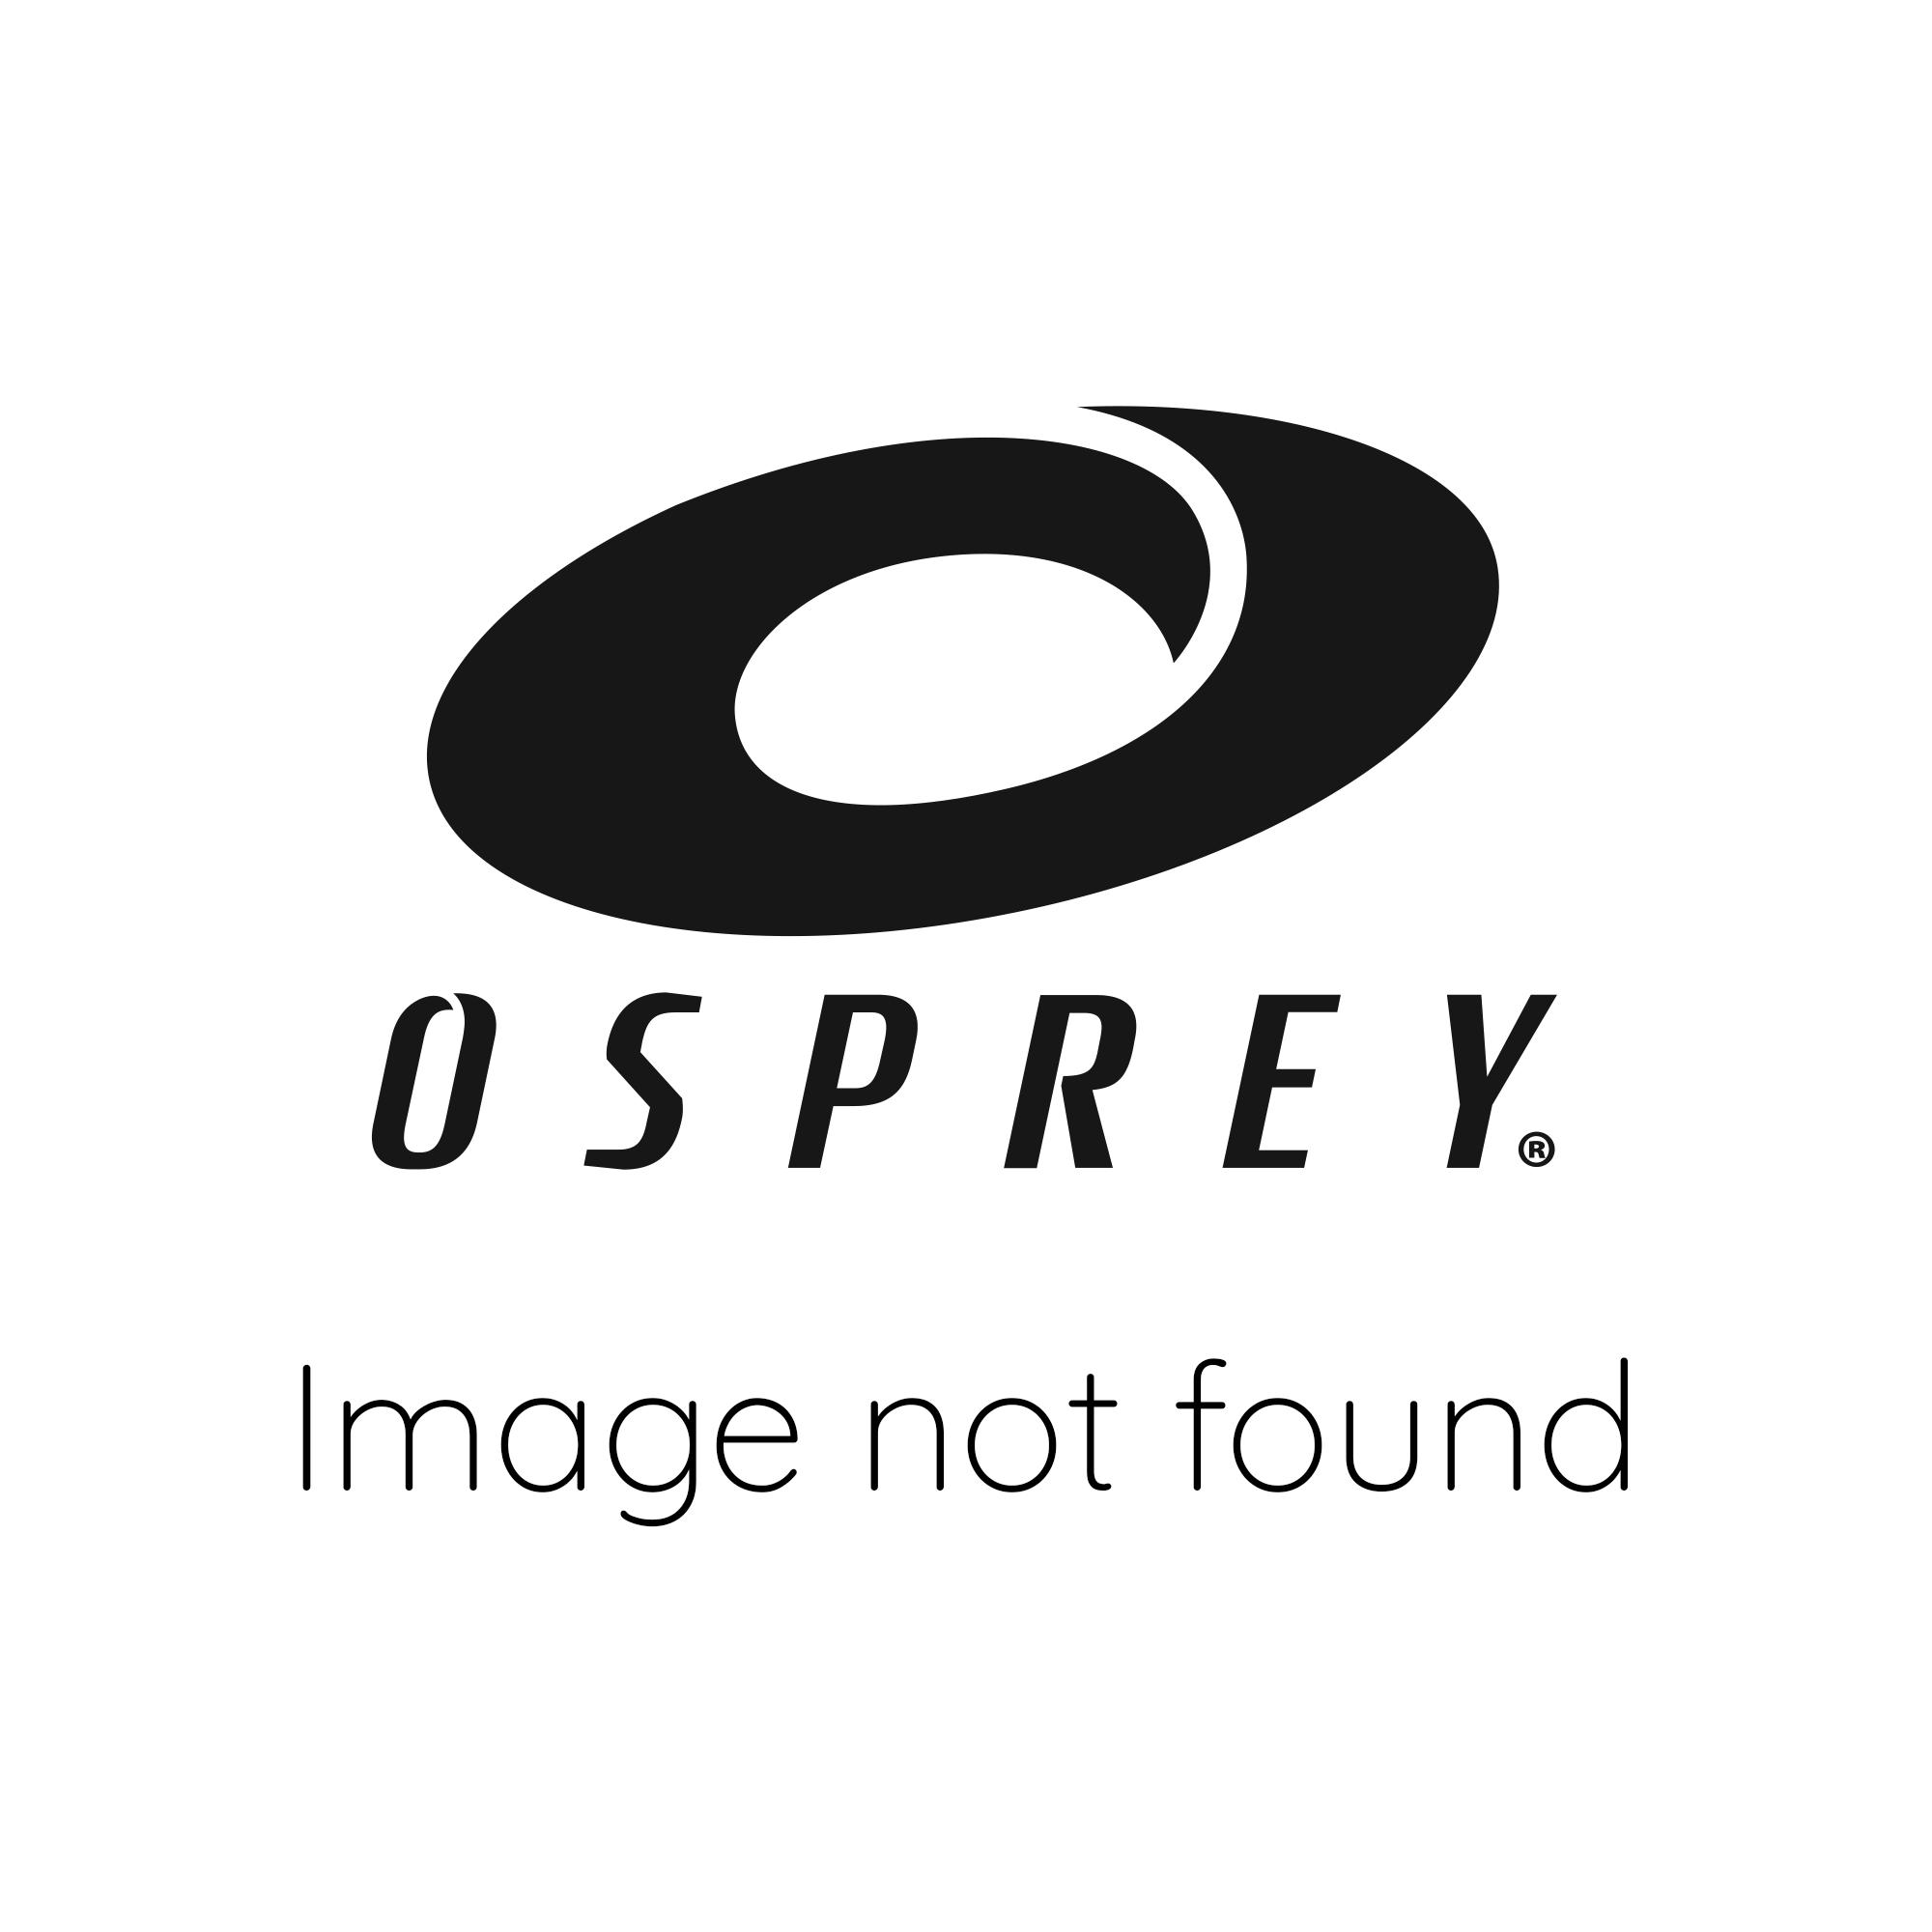 Osprey Womens 3mm Origin Full Length Wetsuit - Pink